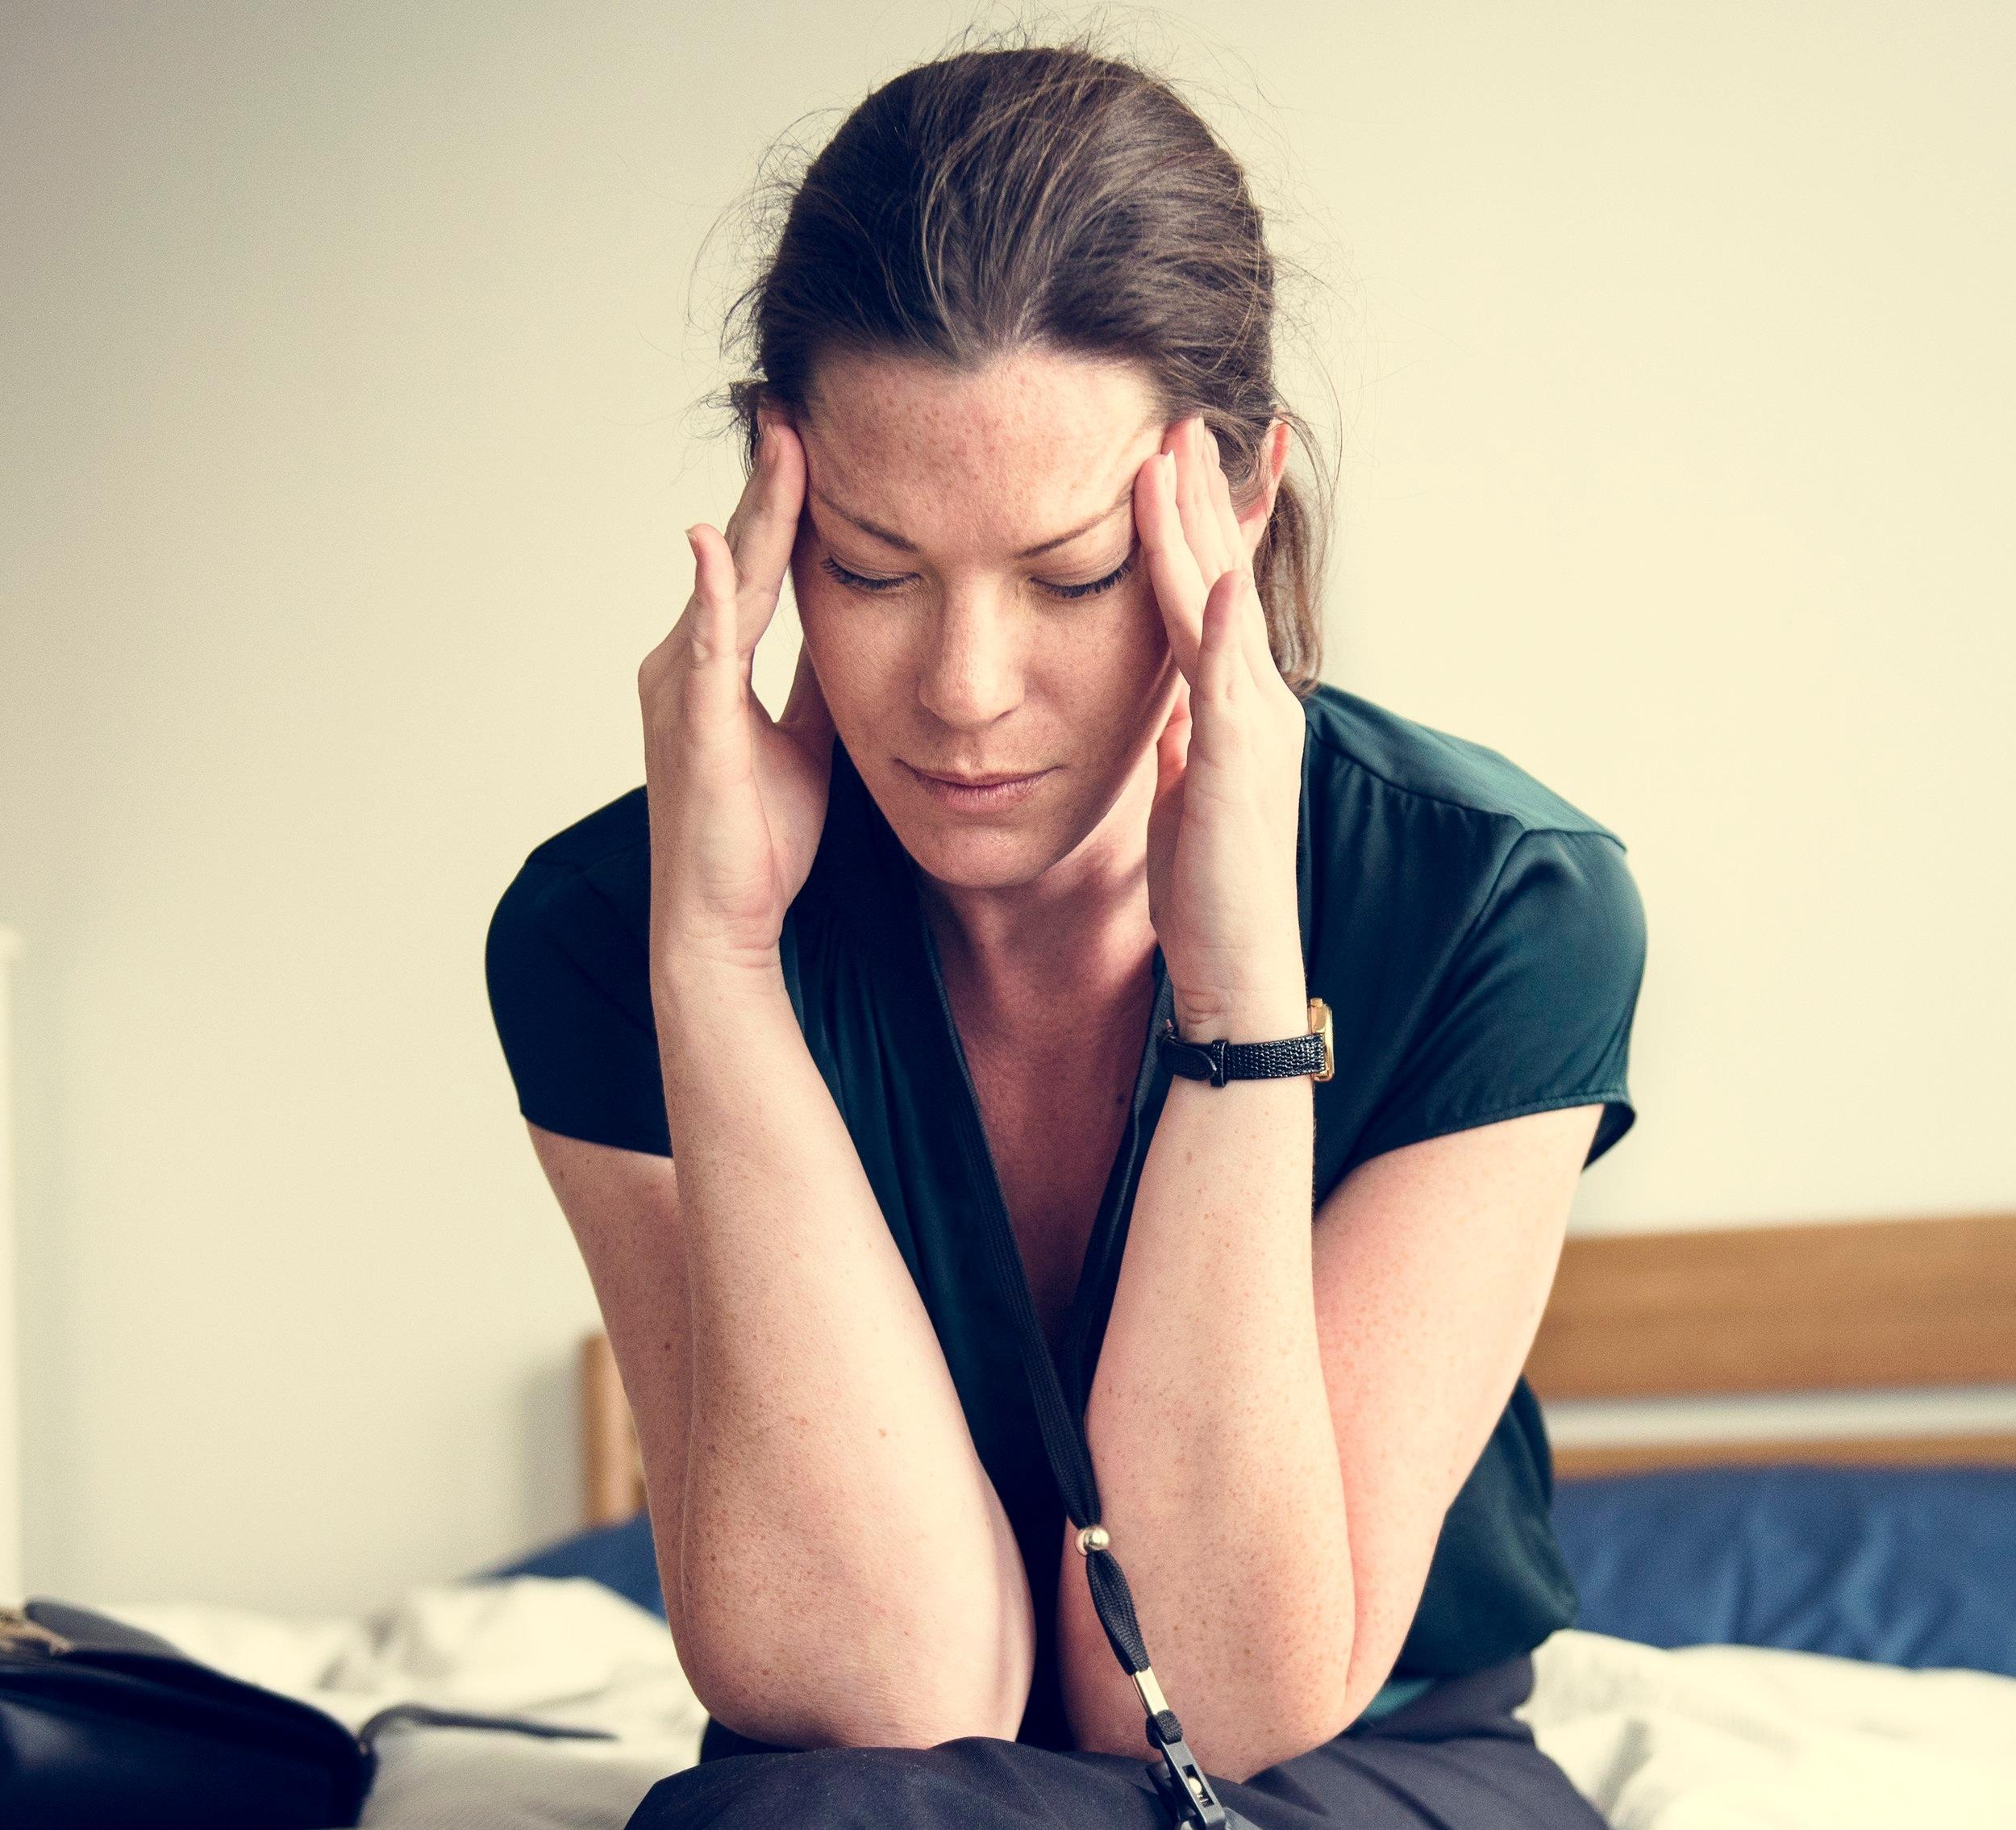 a-stressful-woman-9RJP2AU.jpg